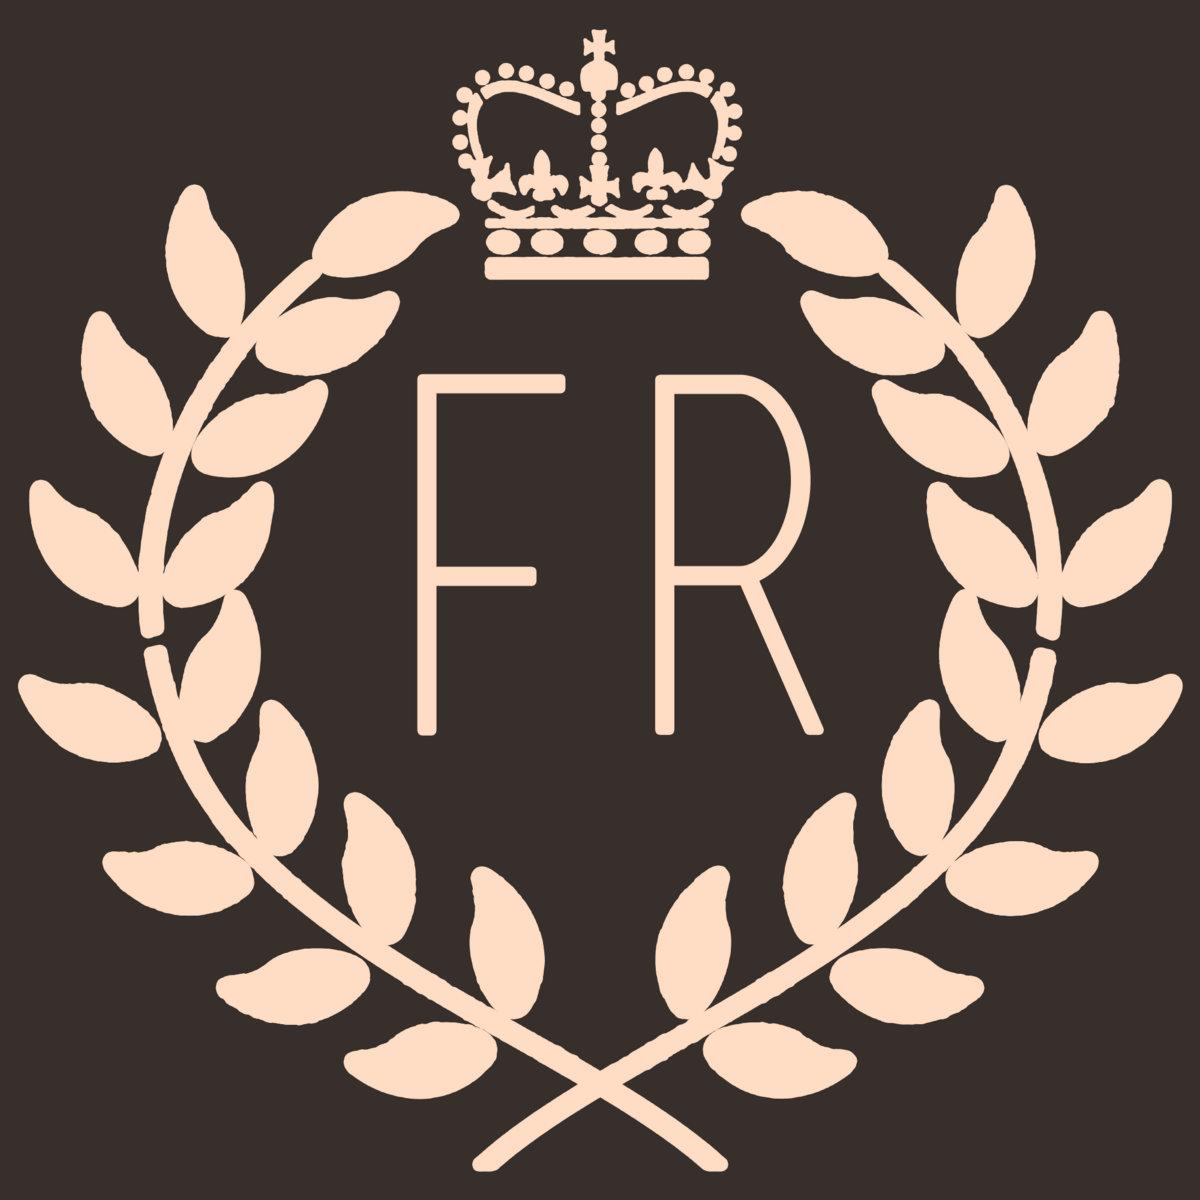 French royalty french royalty french royalty image biocorpaavc Gallery